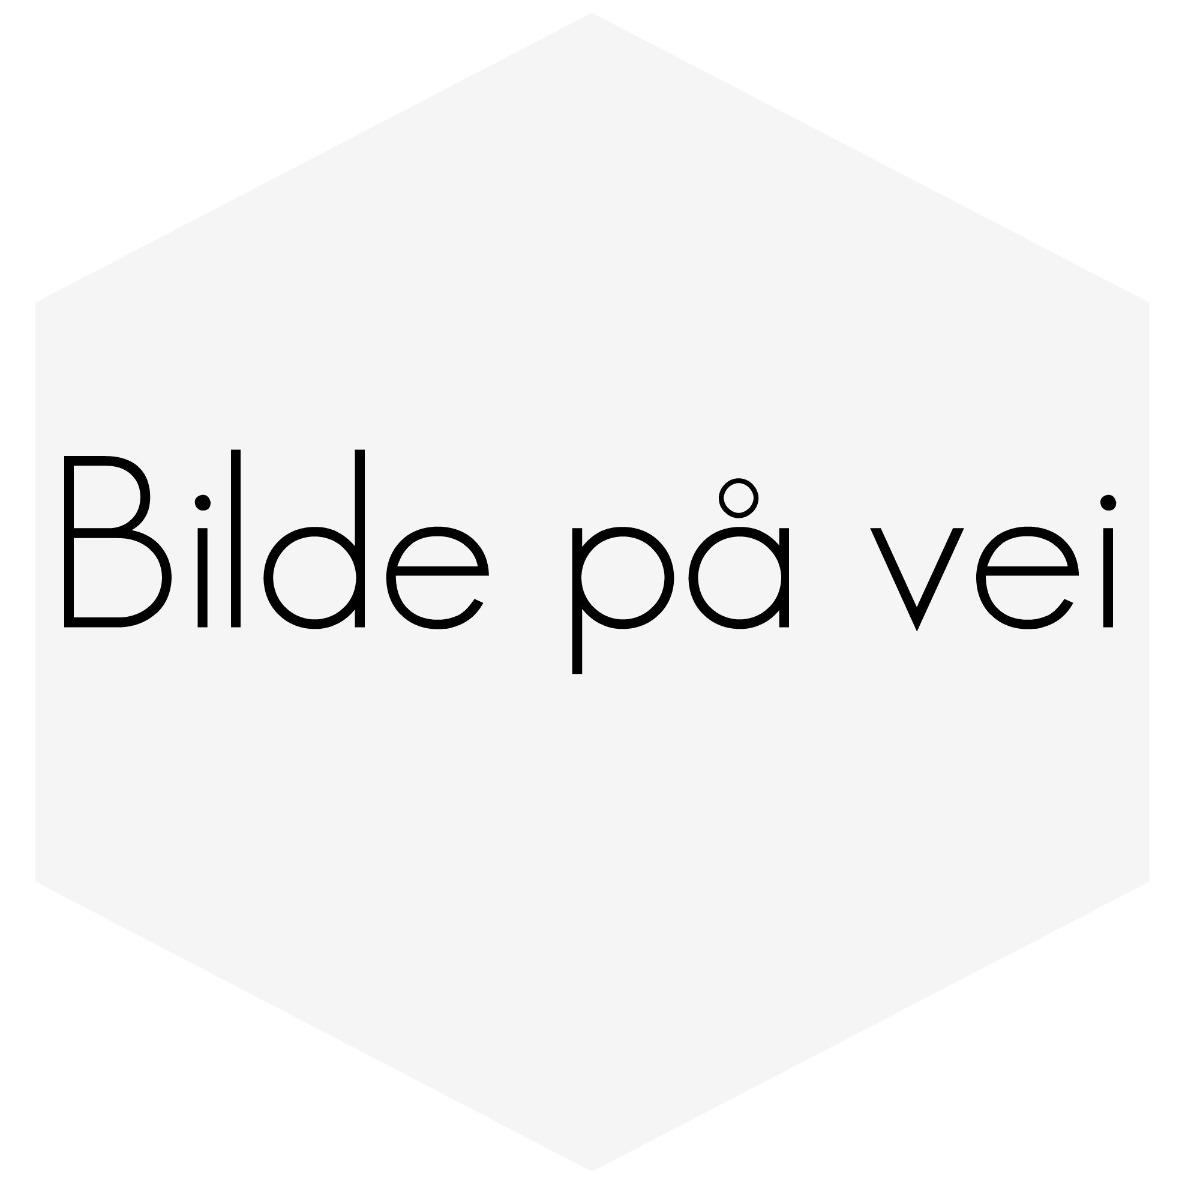 BLINKLAMPE S/V40-2001>04 VenstreTYP M/CROM RUNDT REFLEKTOR